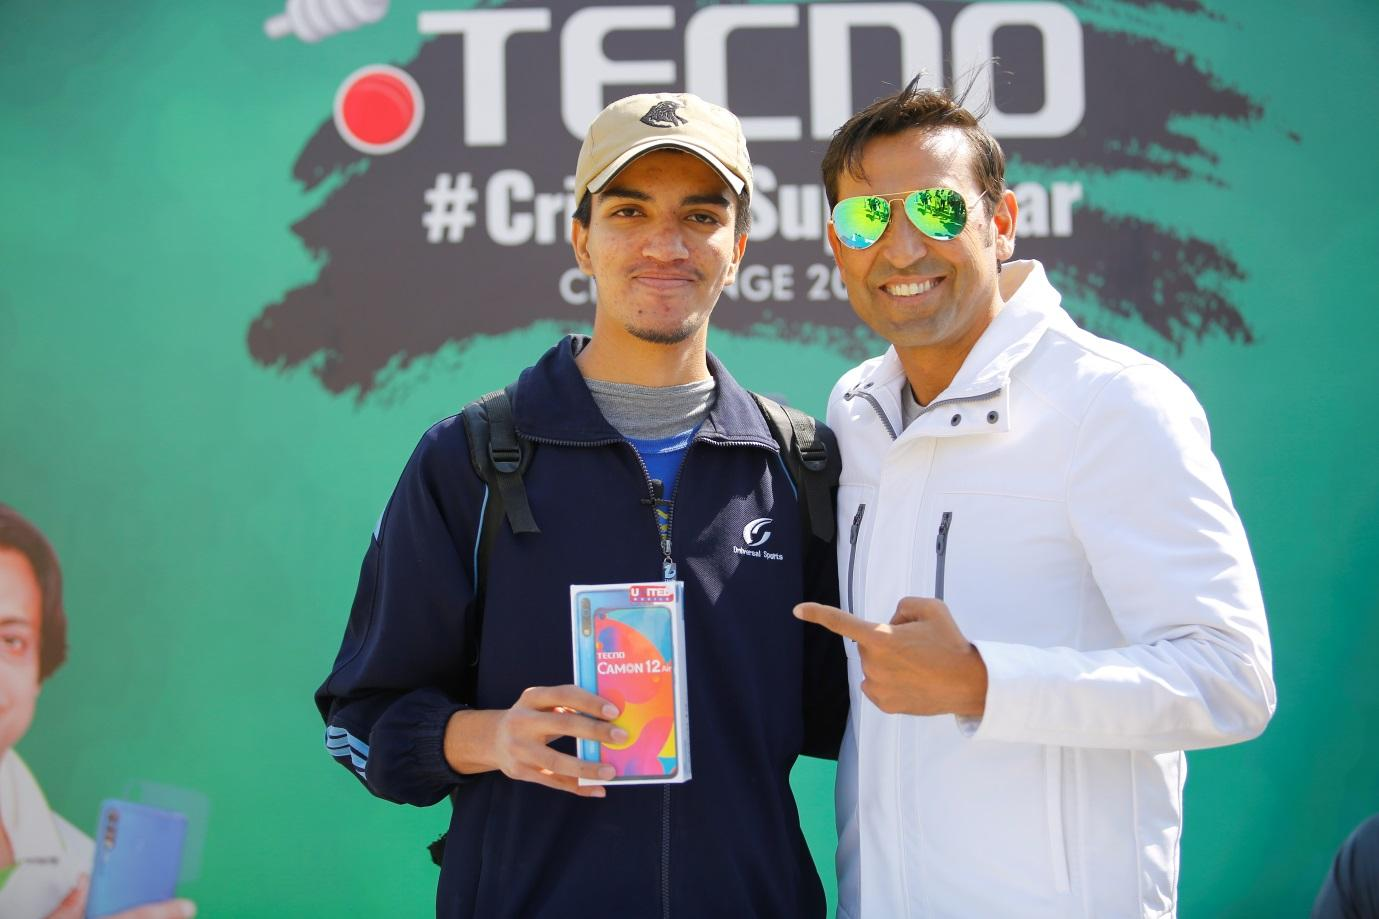 TECNO Real time Cricket